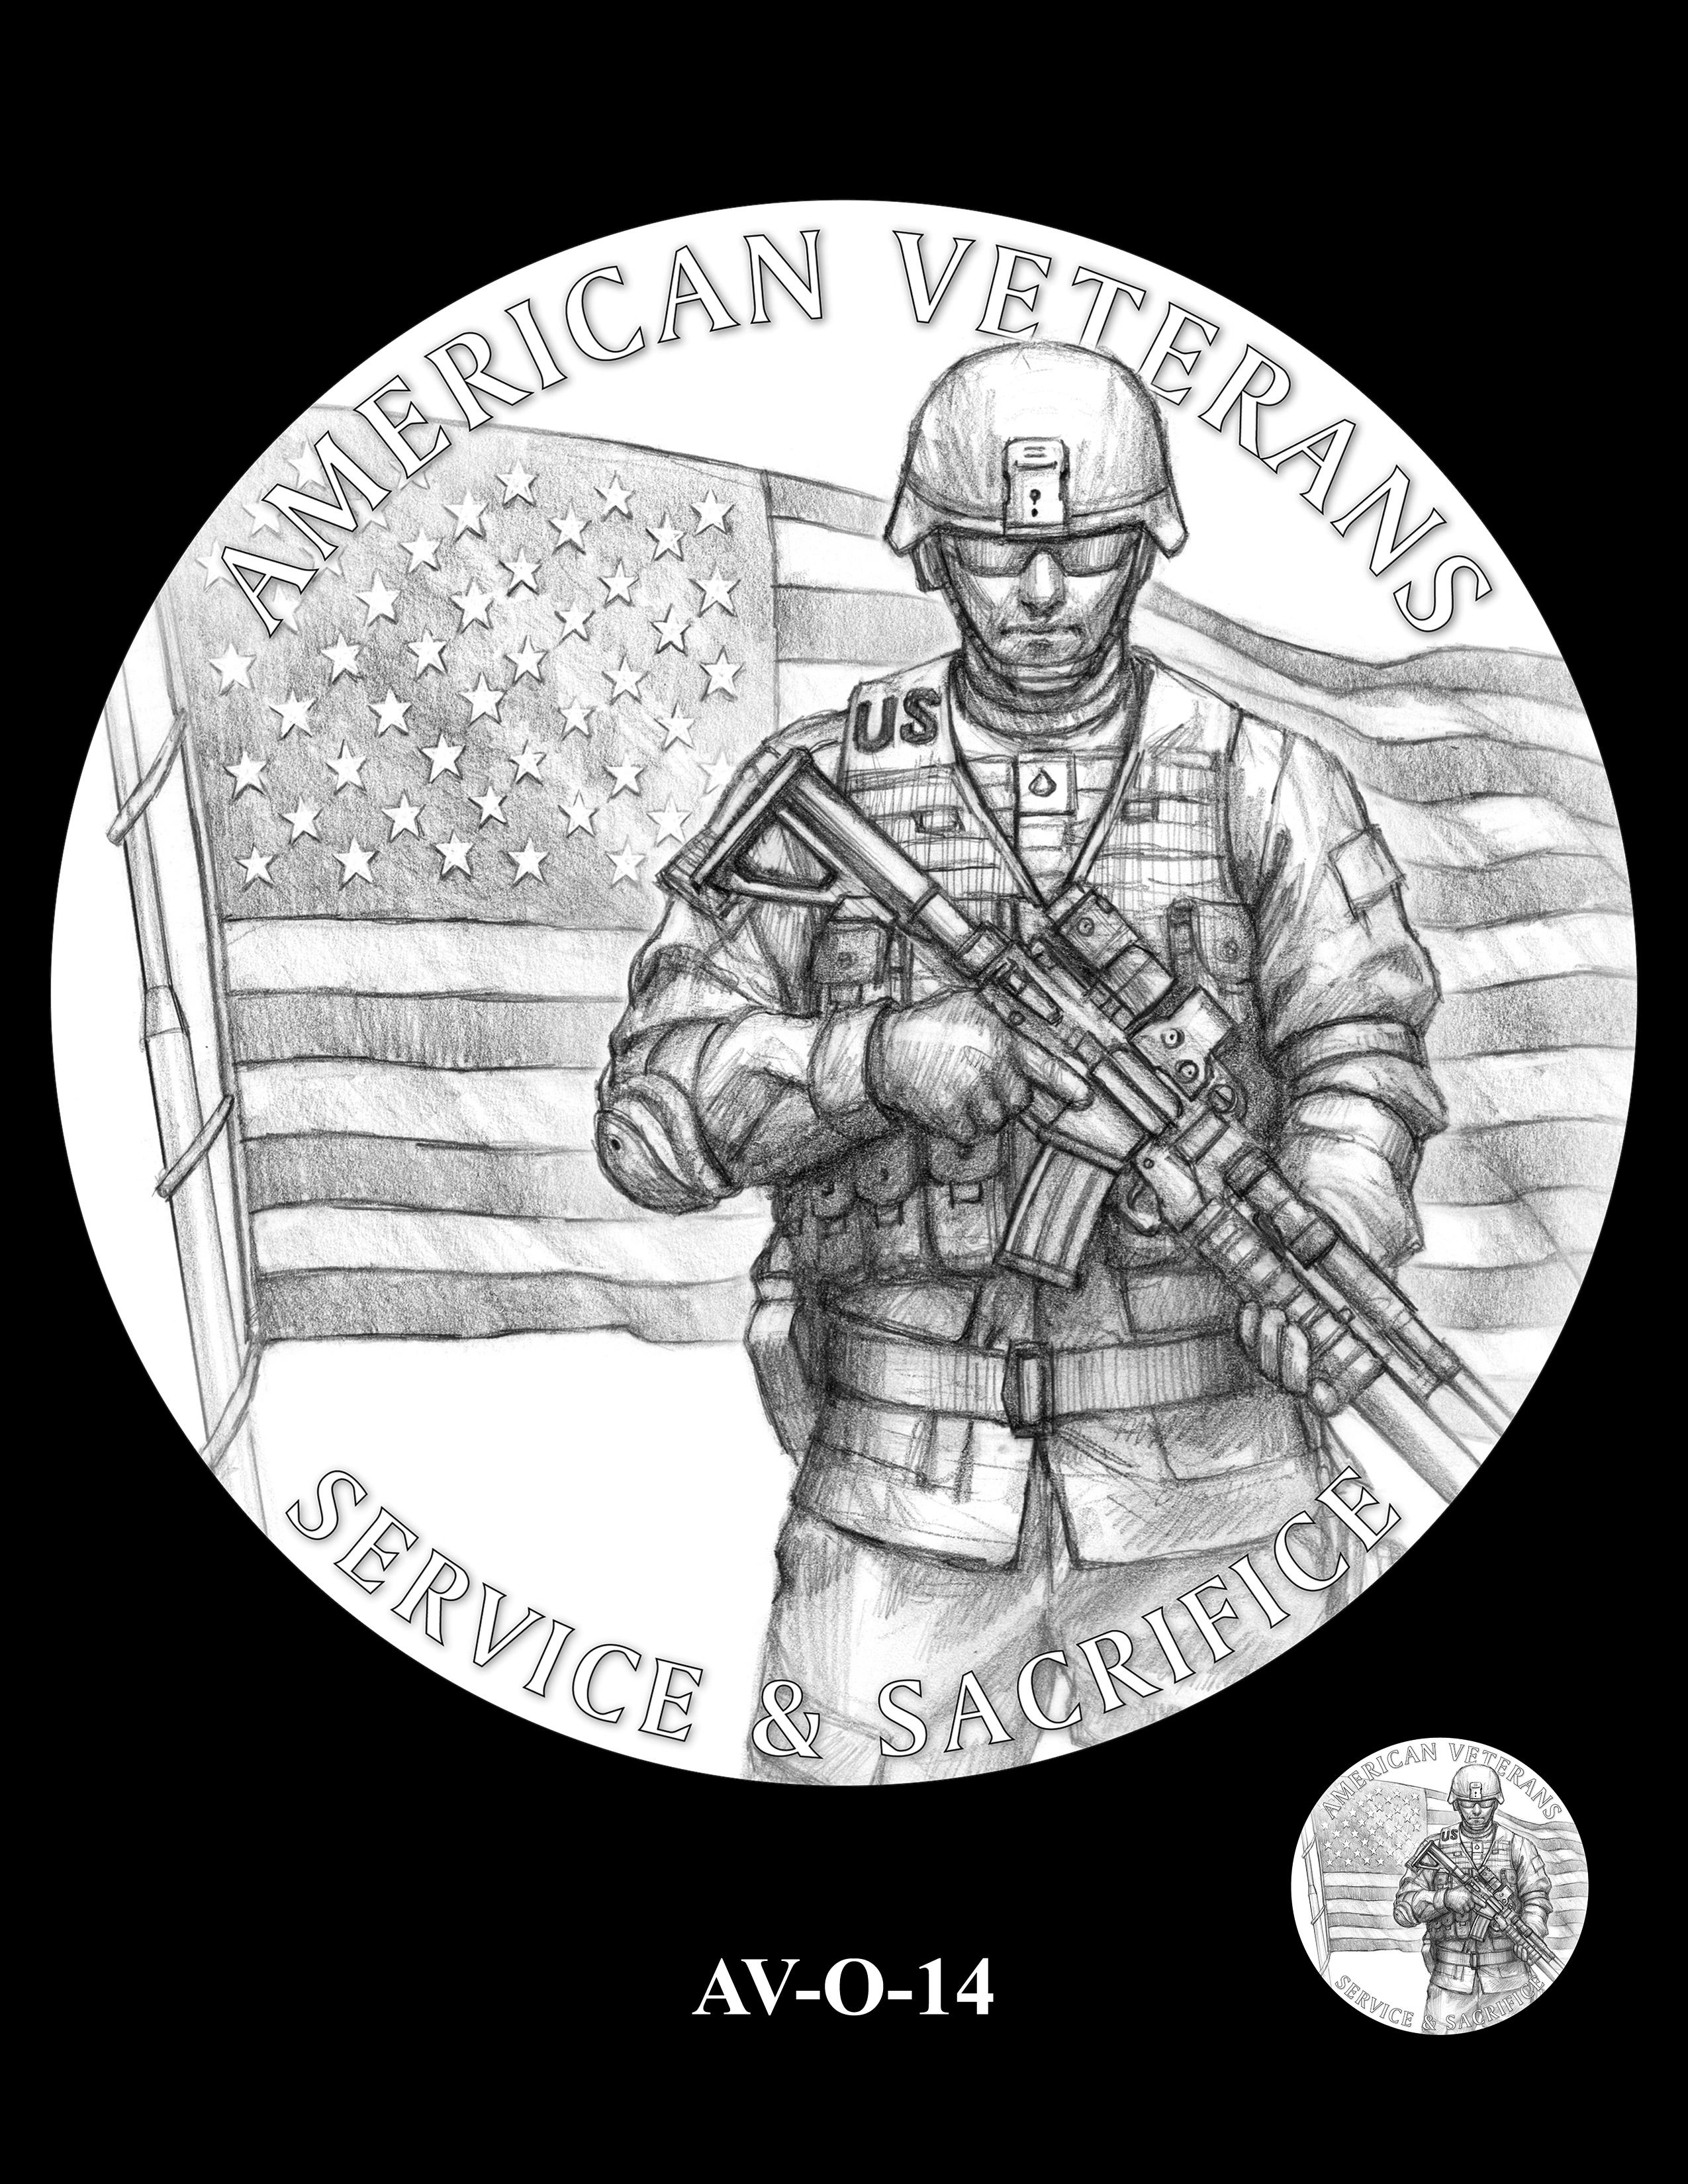 AV-O-14 - American Veterans Medal